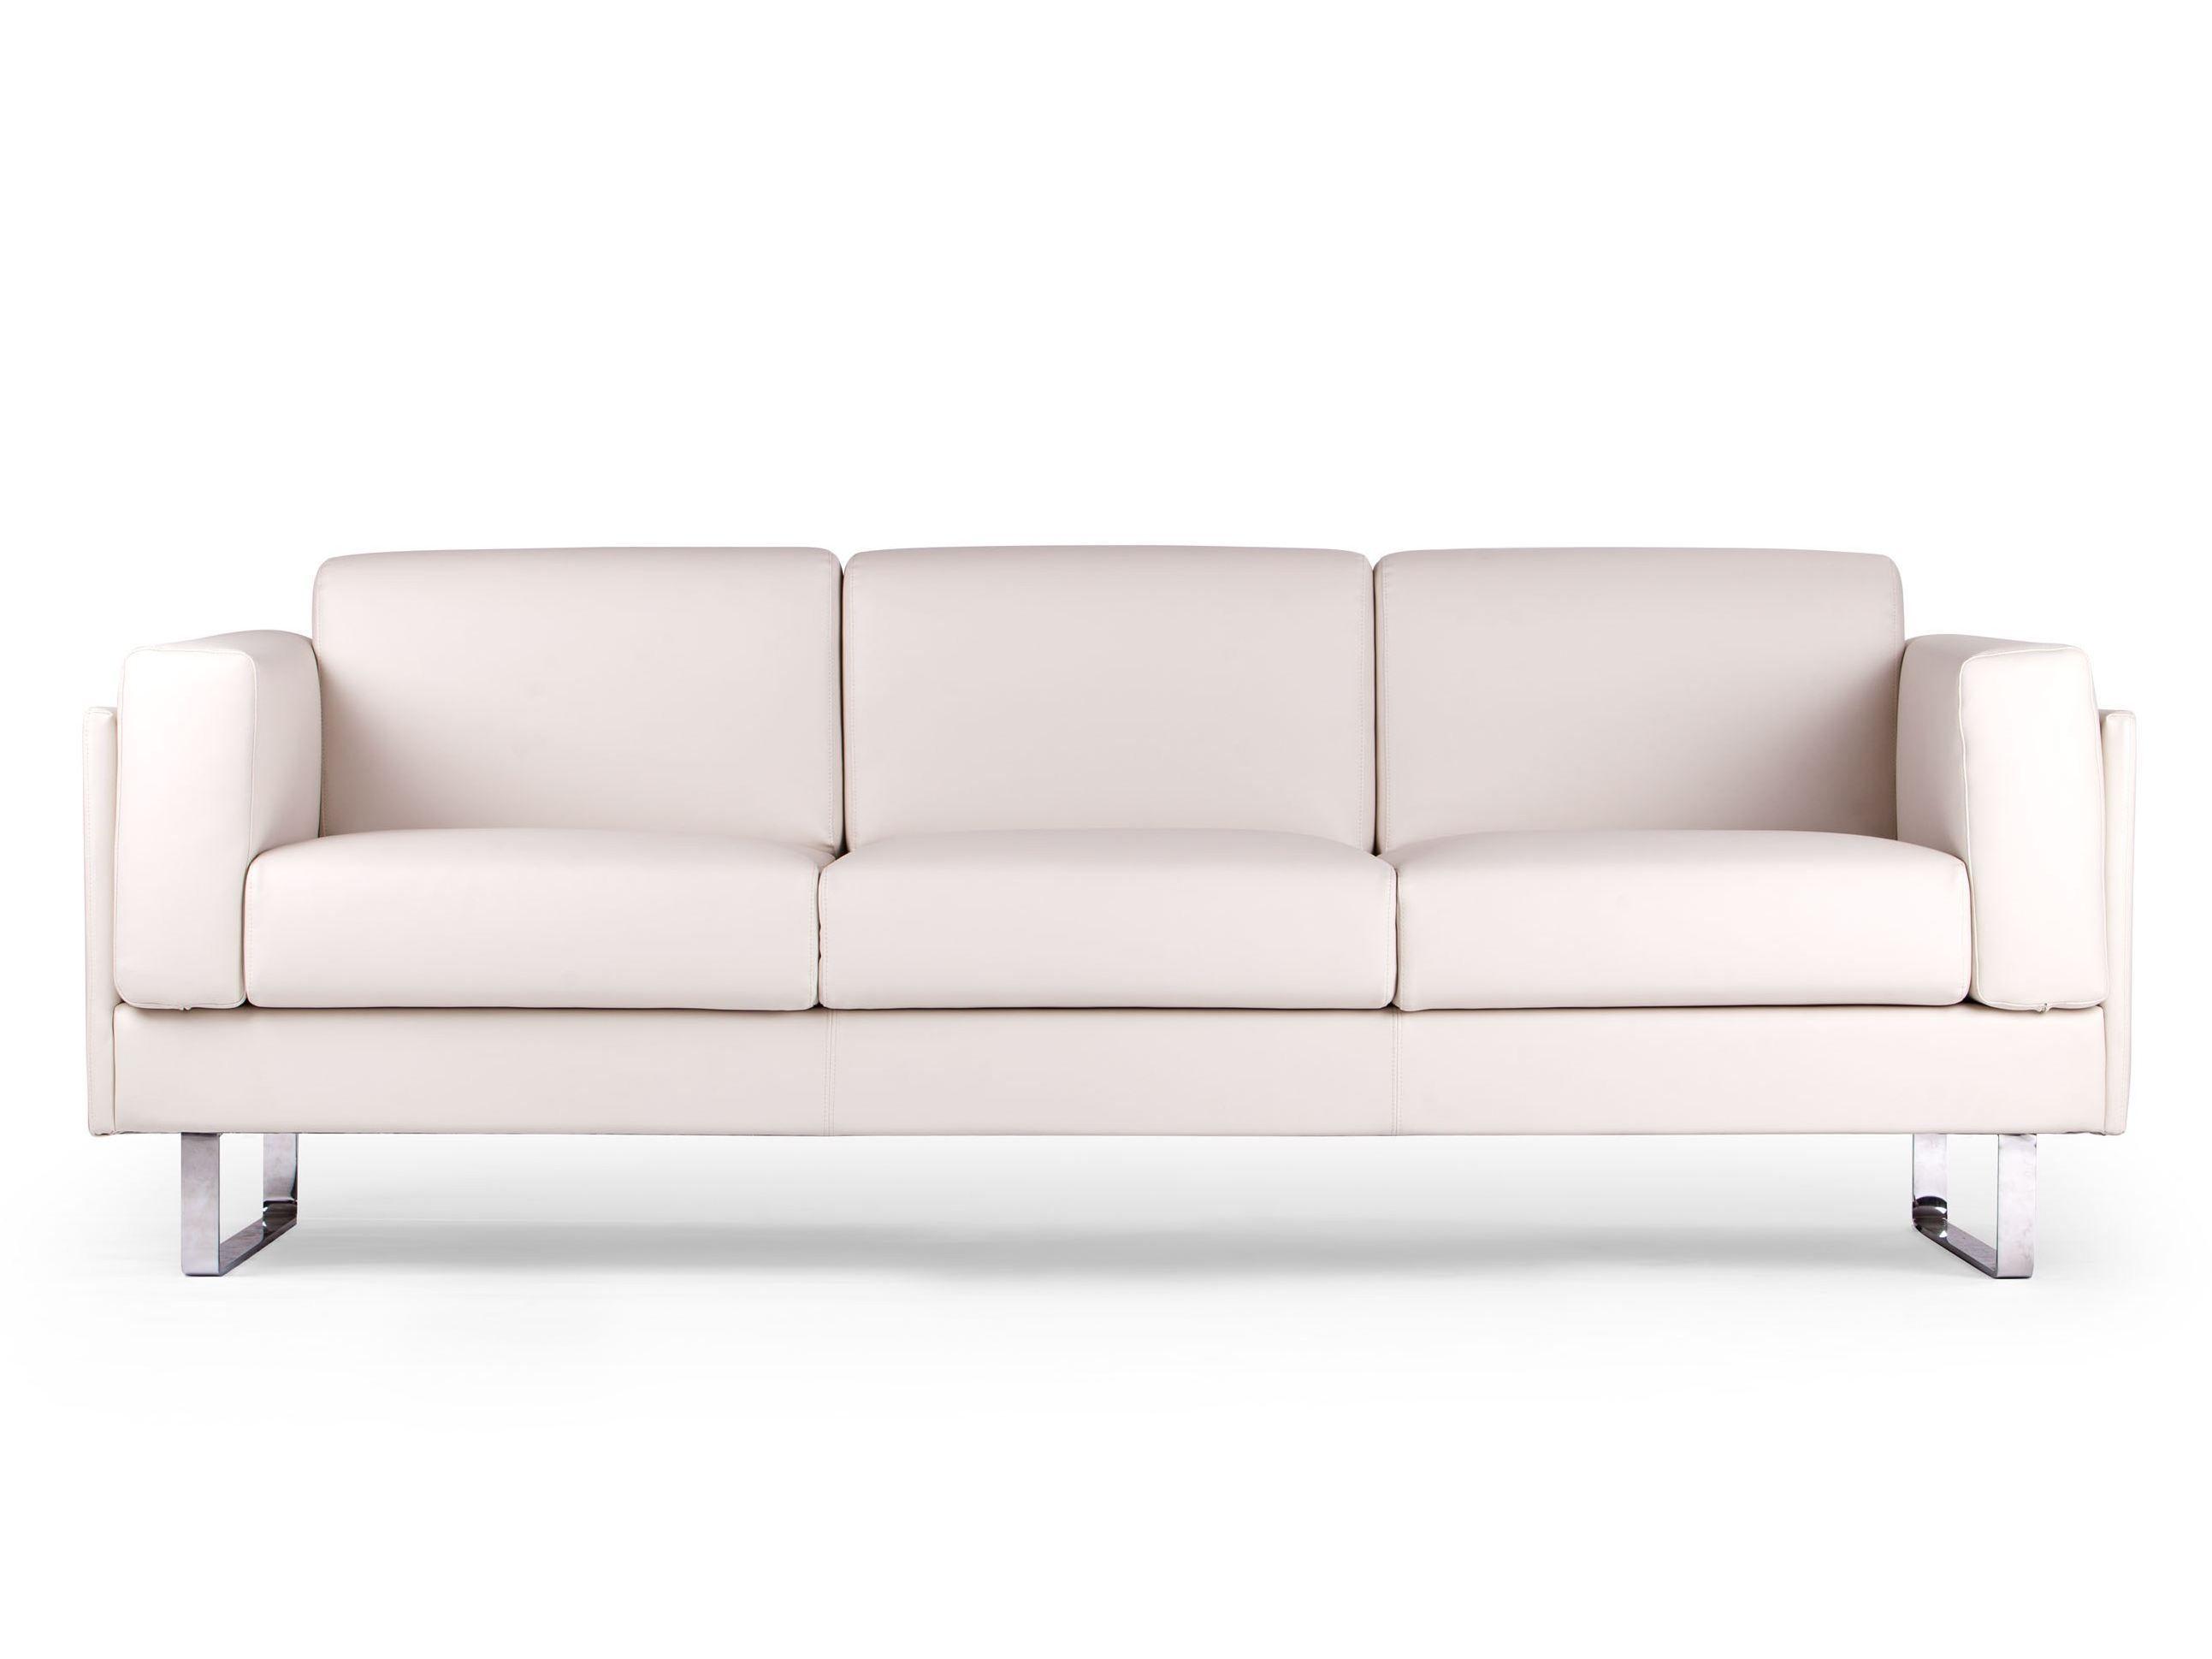 CAB | 3 Seater Sofa By True Design